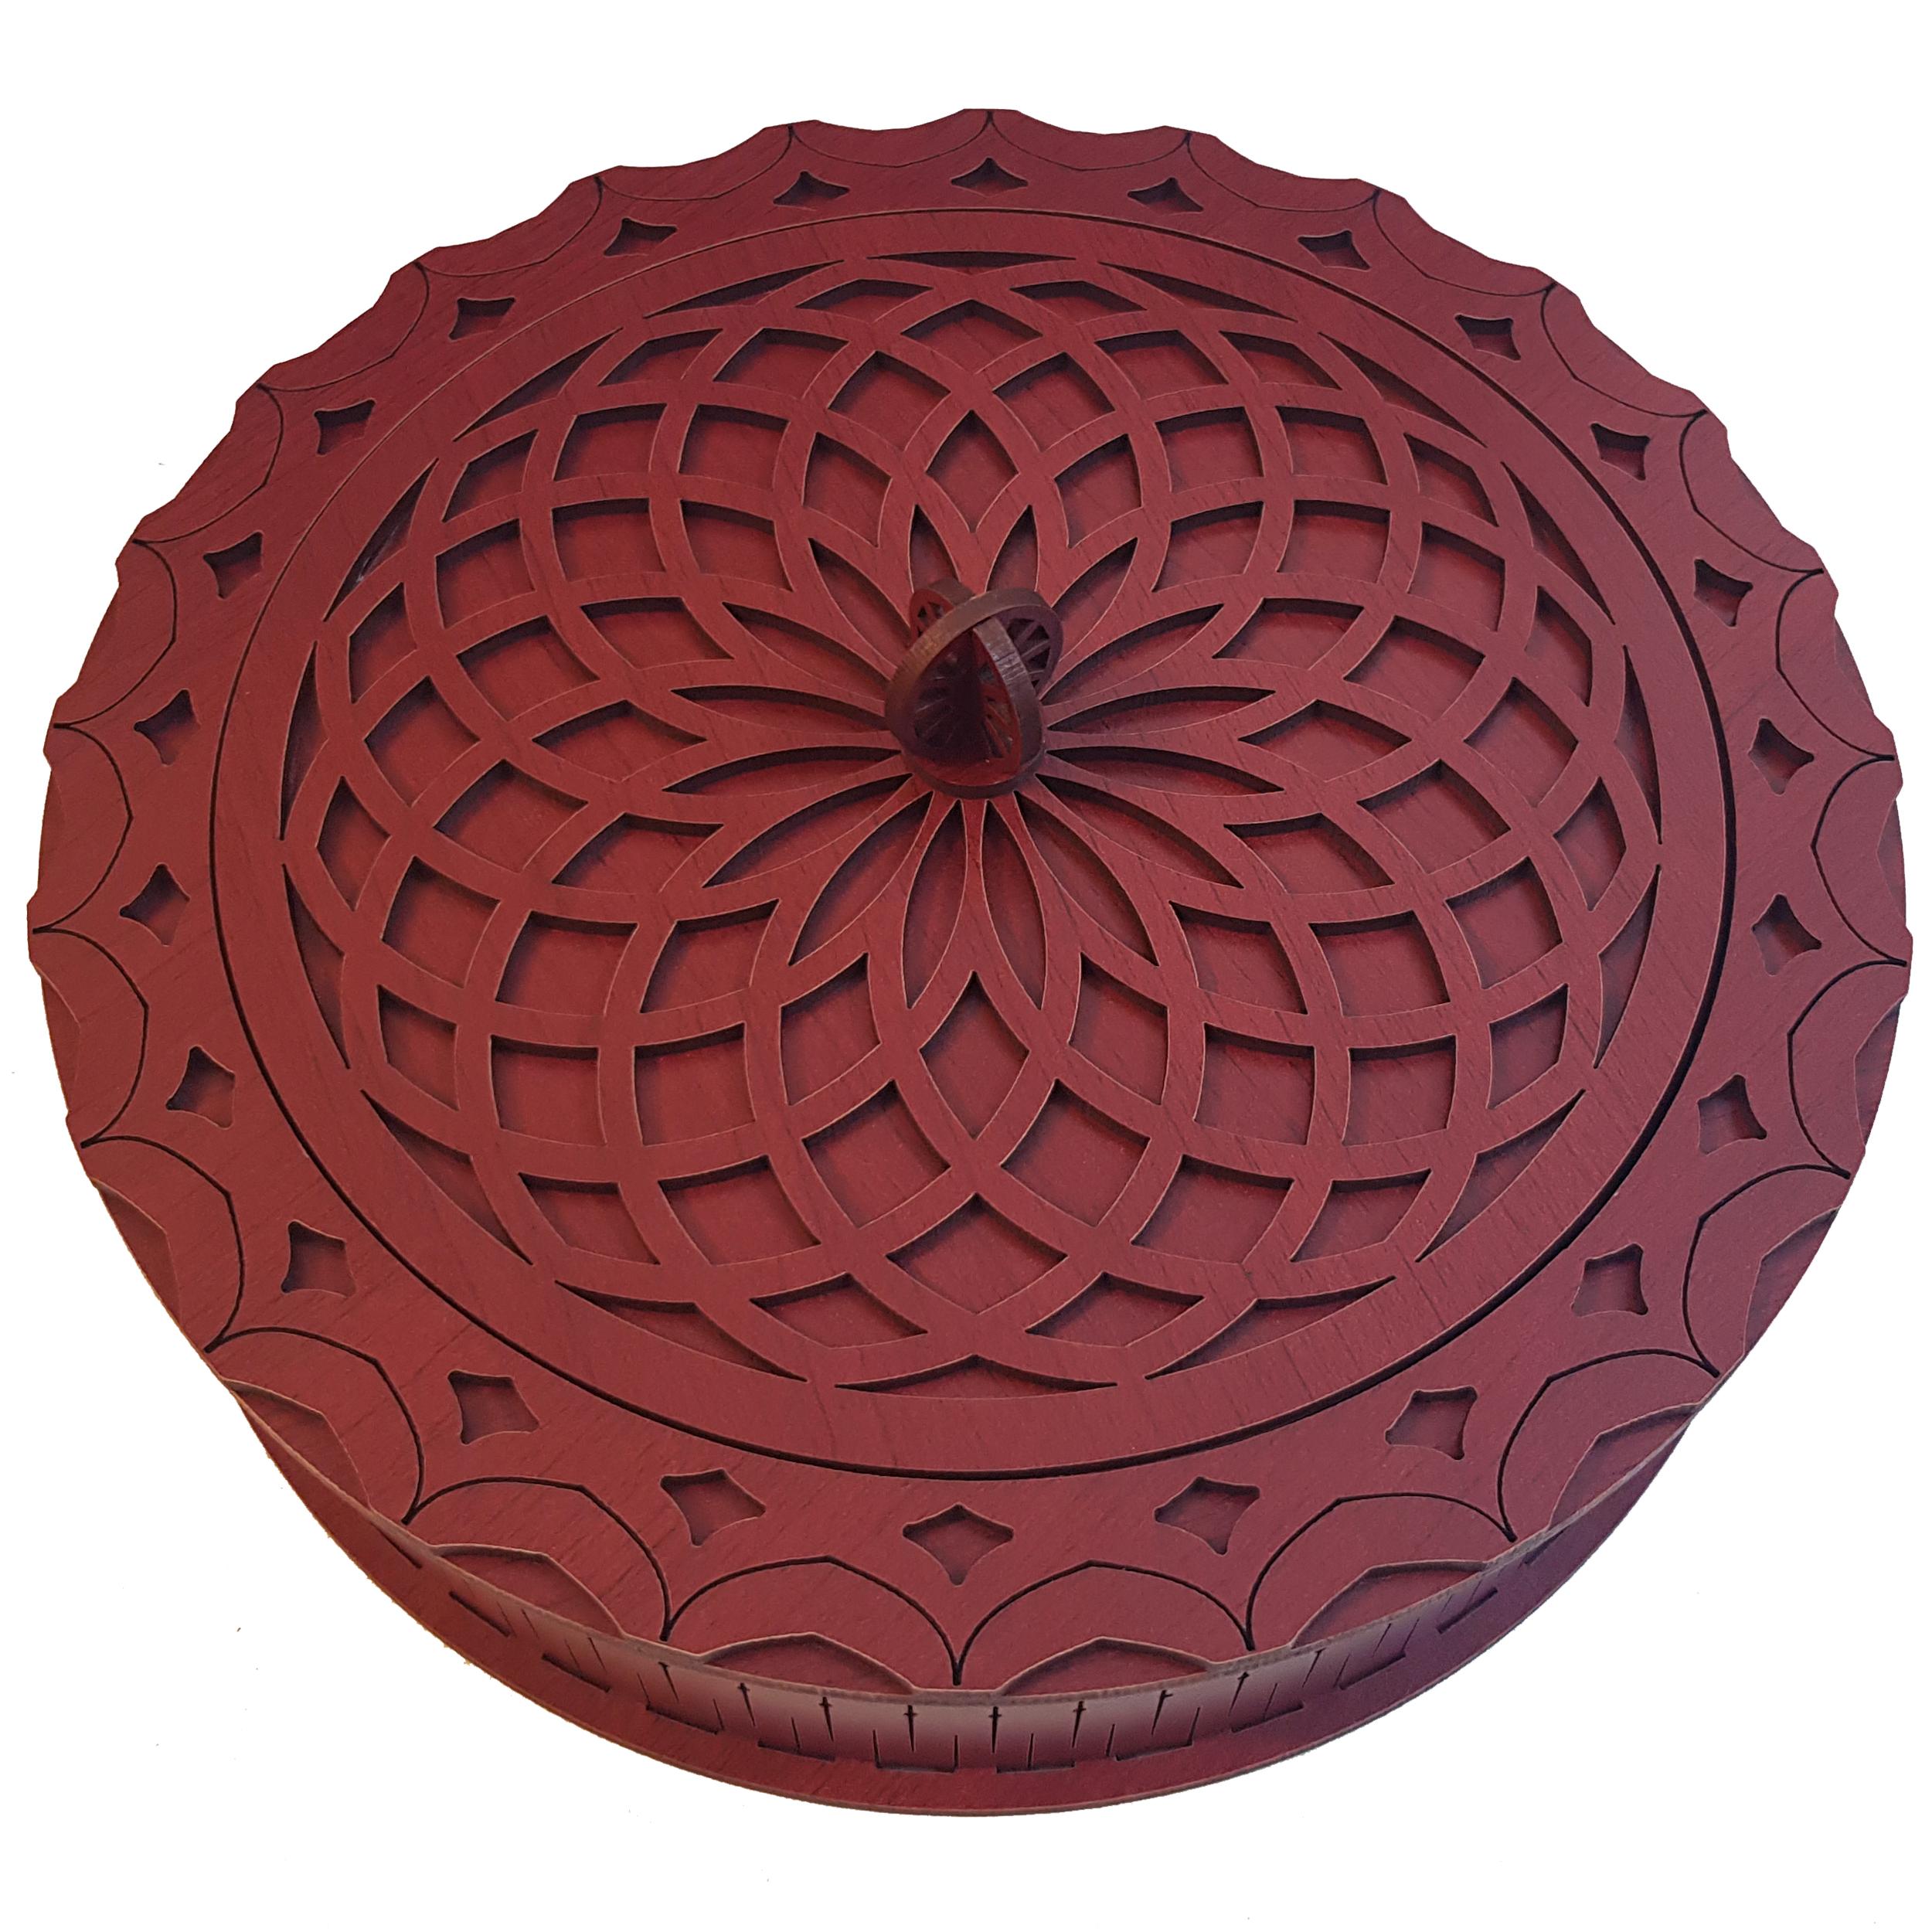 عکس شکلات خوری مدل ماندالا کد mw20